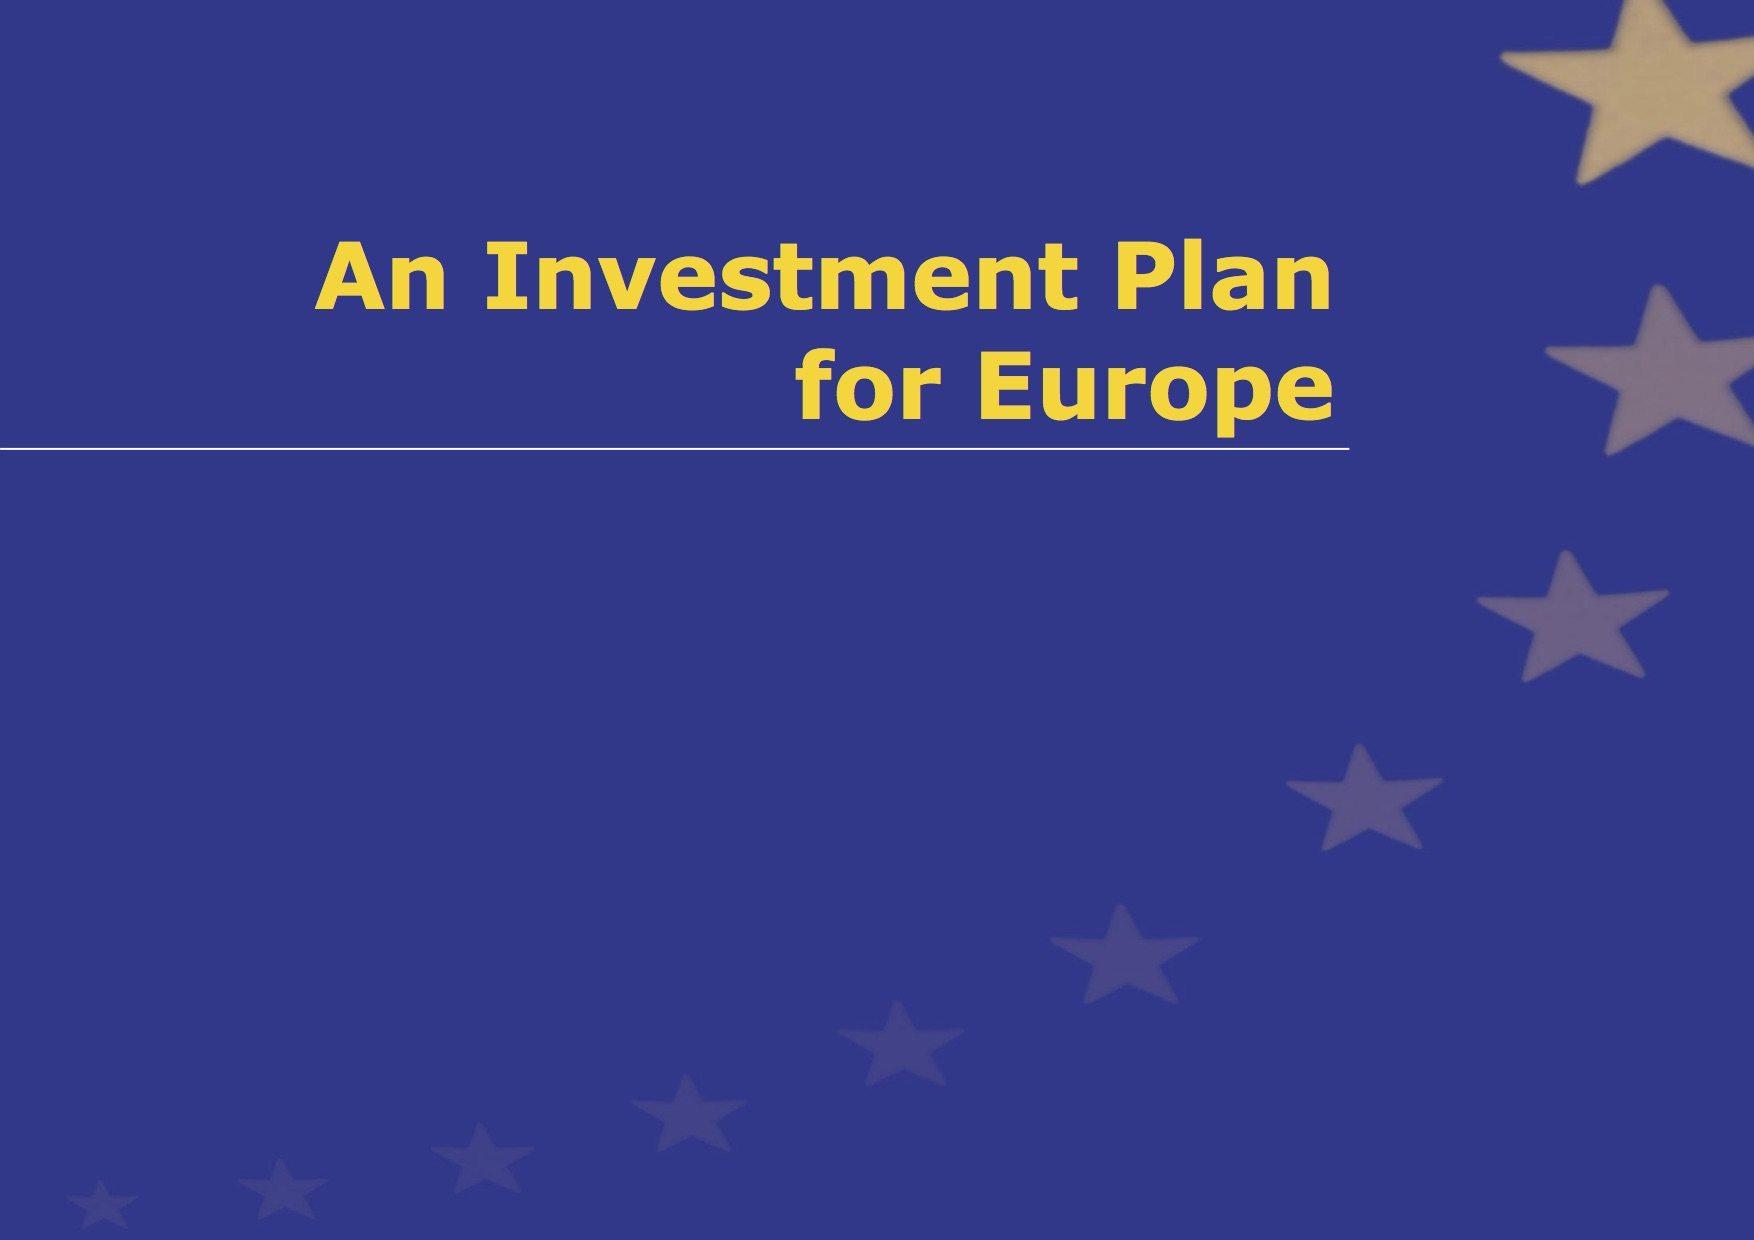 invest_in_europe_enjpeg